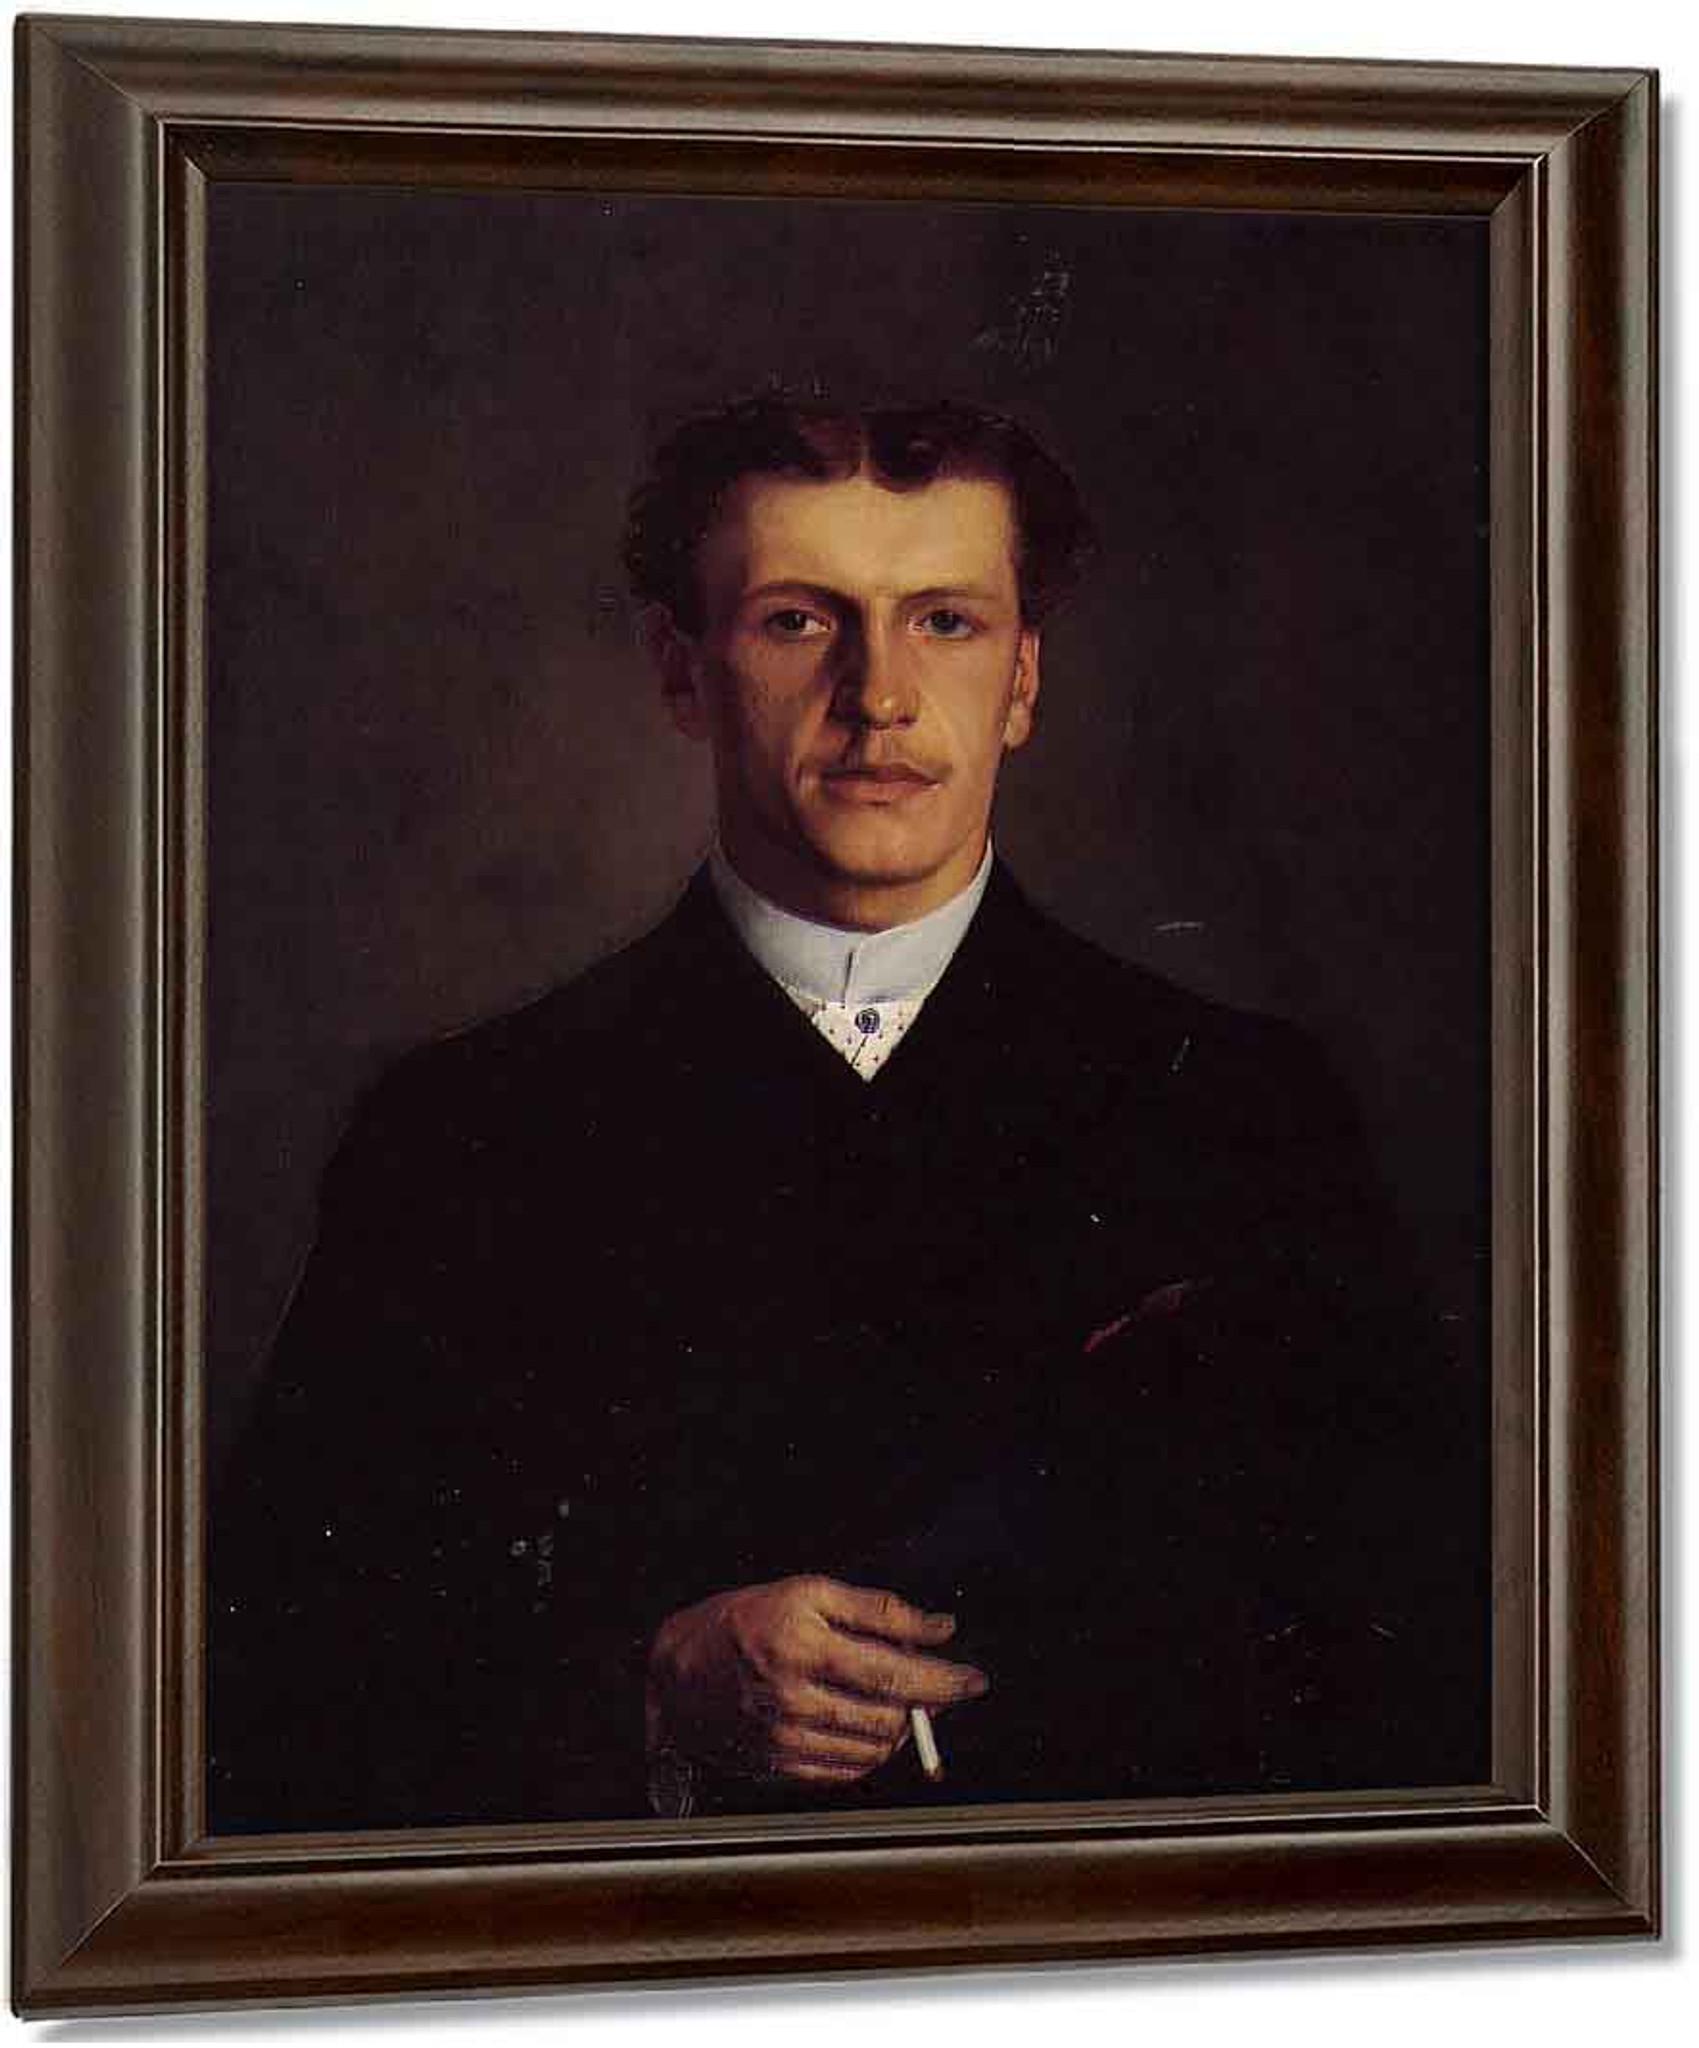 Felix Valloton